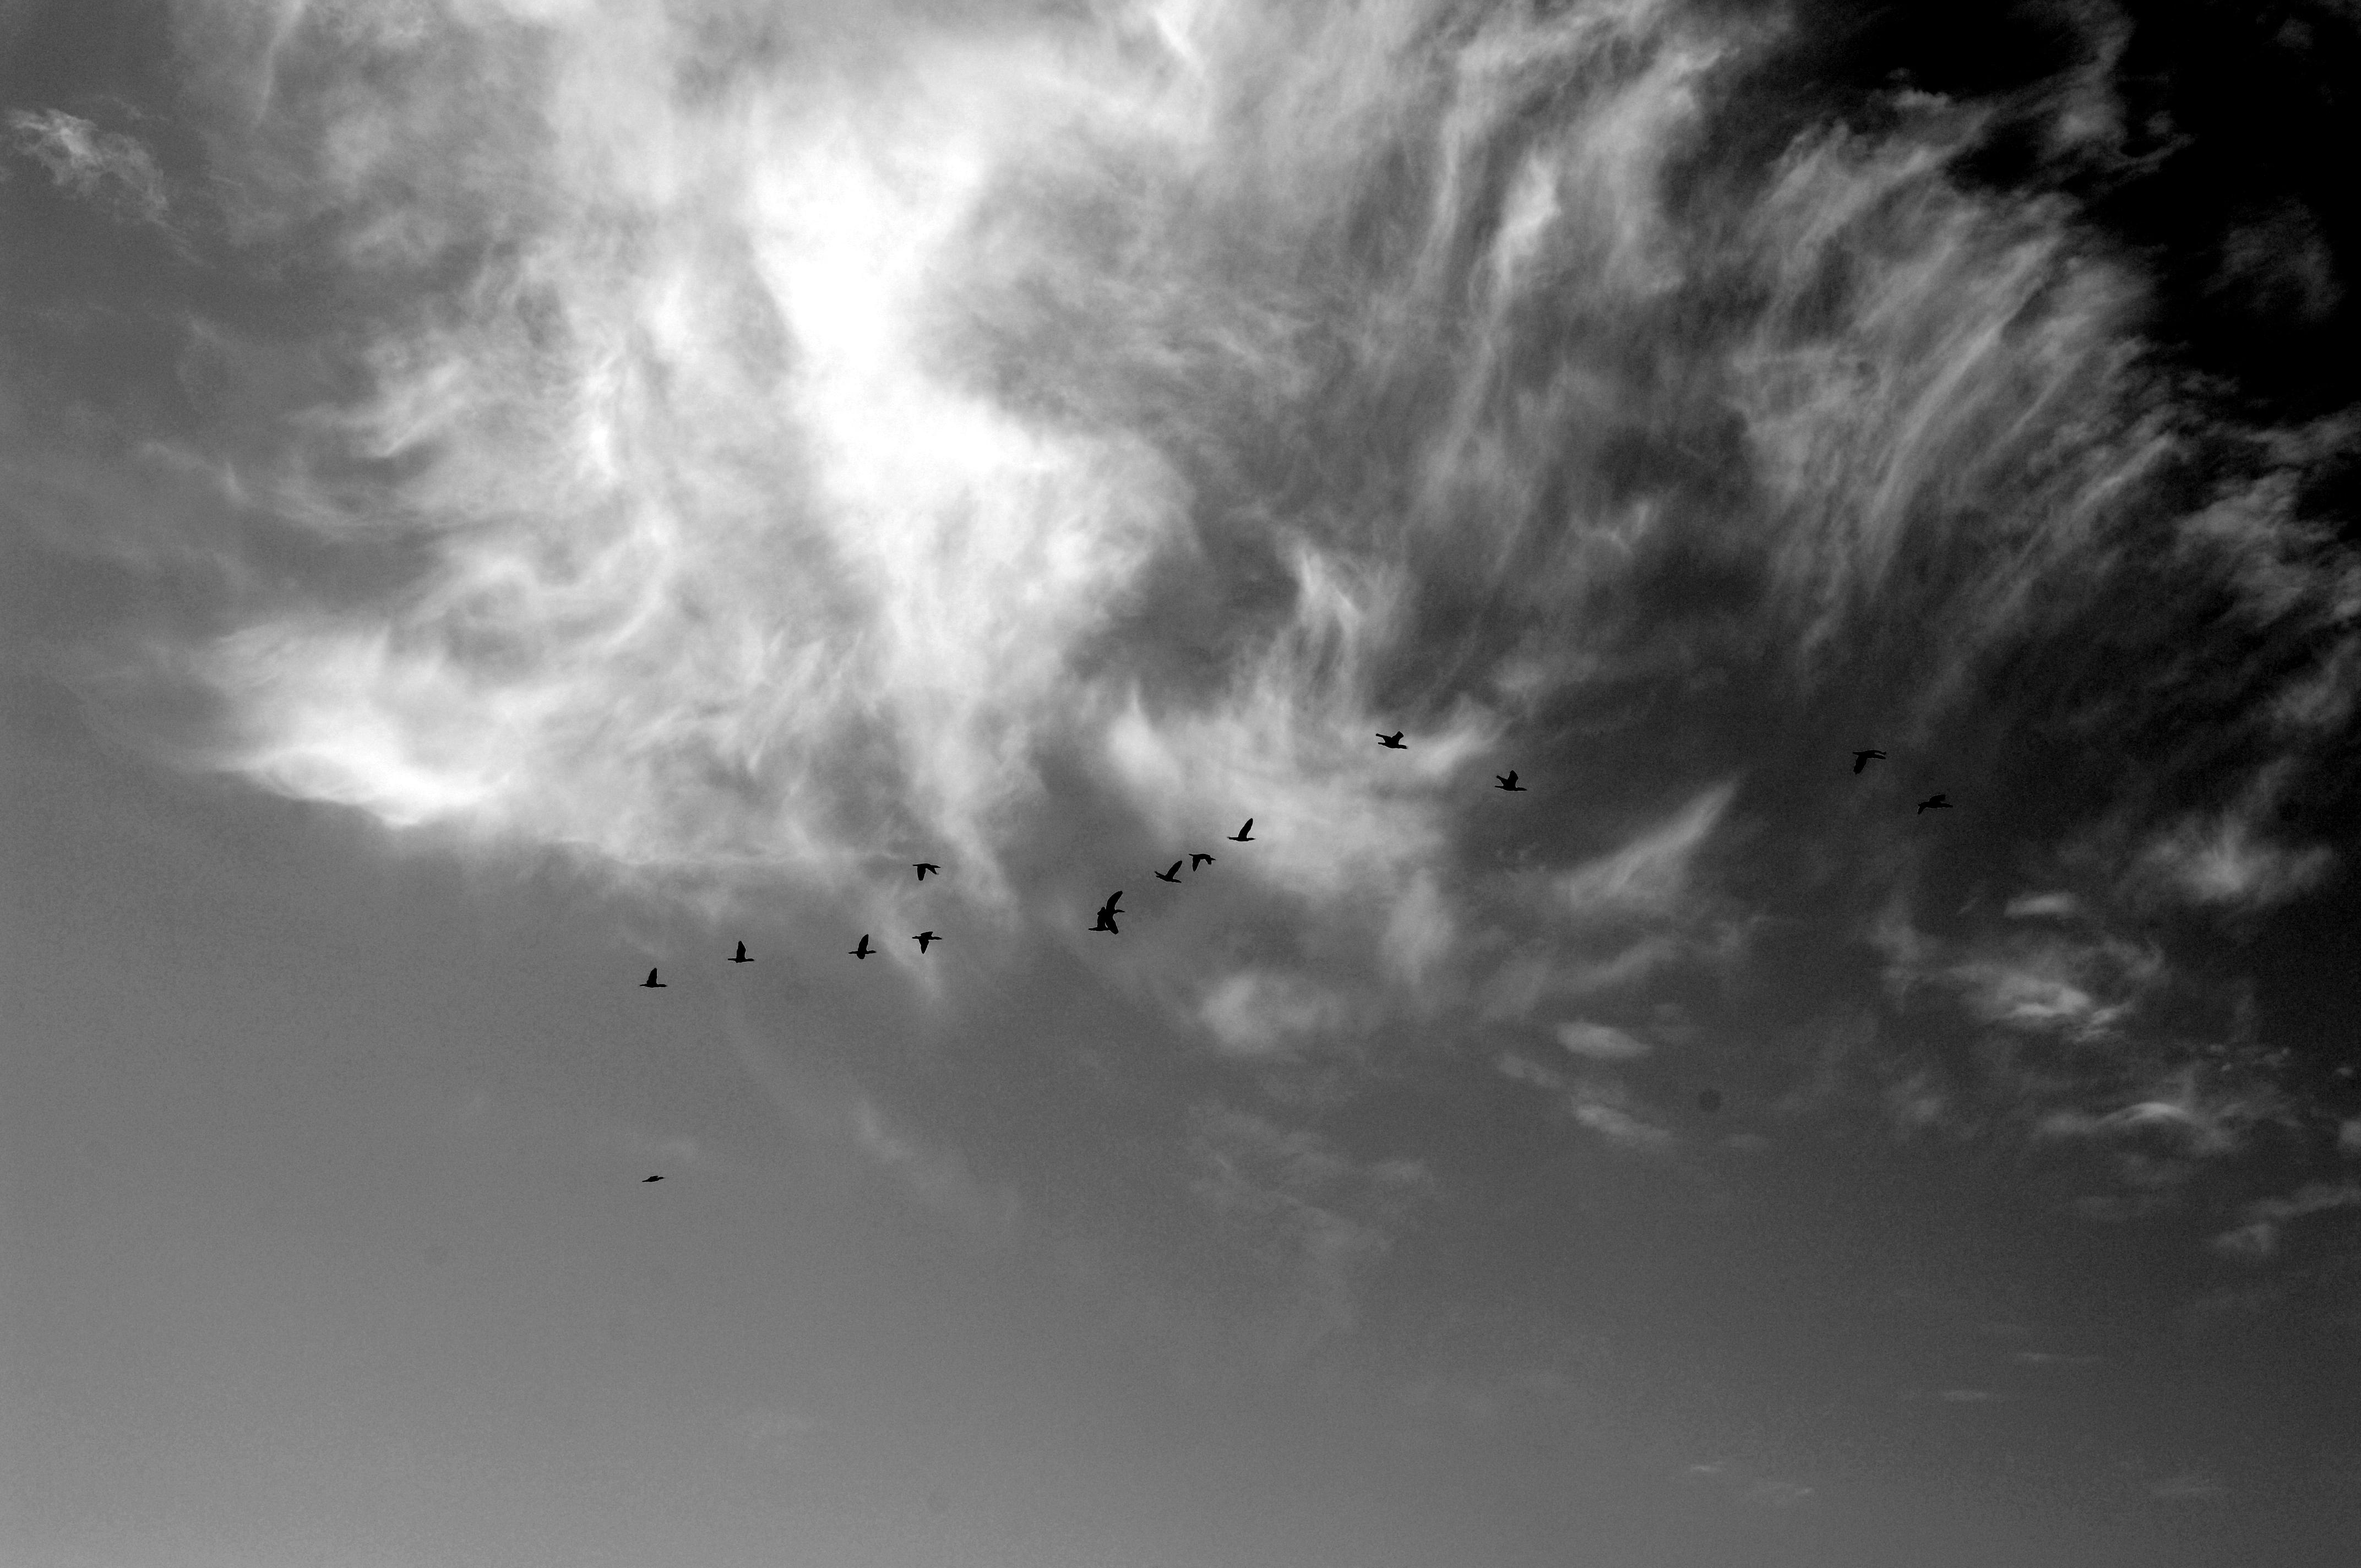 BIRDS OVER HEAD